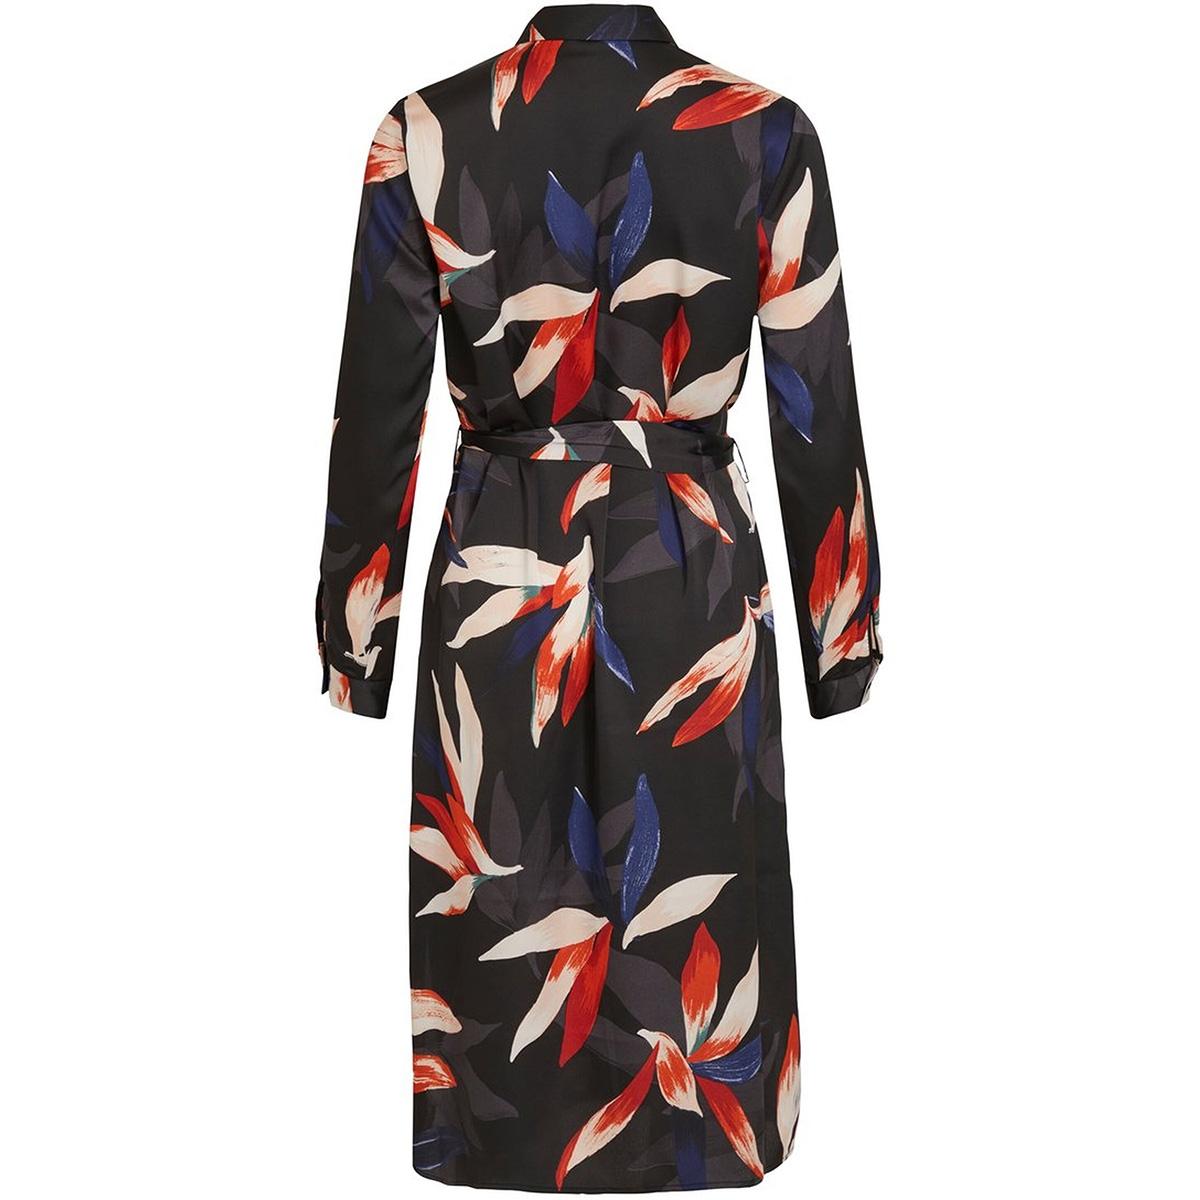 objmichelle l/s shirt dress a div 23033620 object jurk sky capitain/big leave